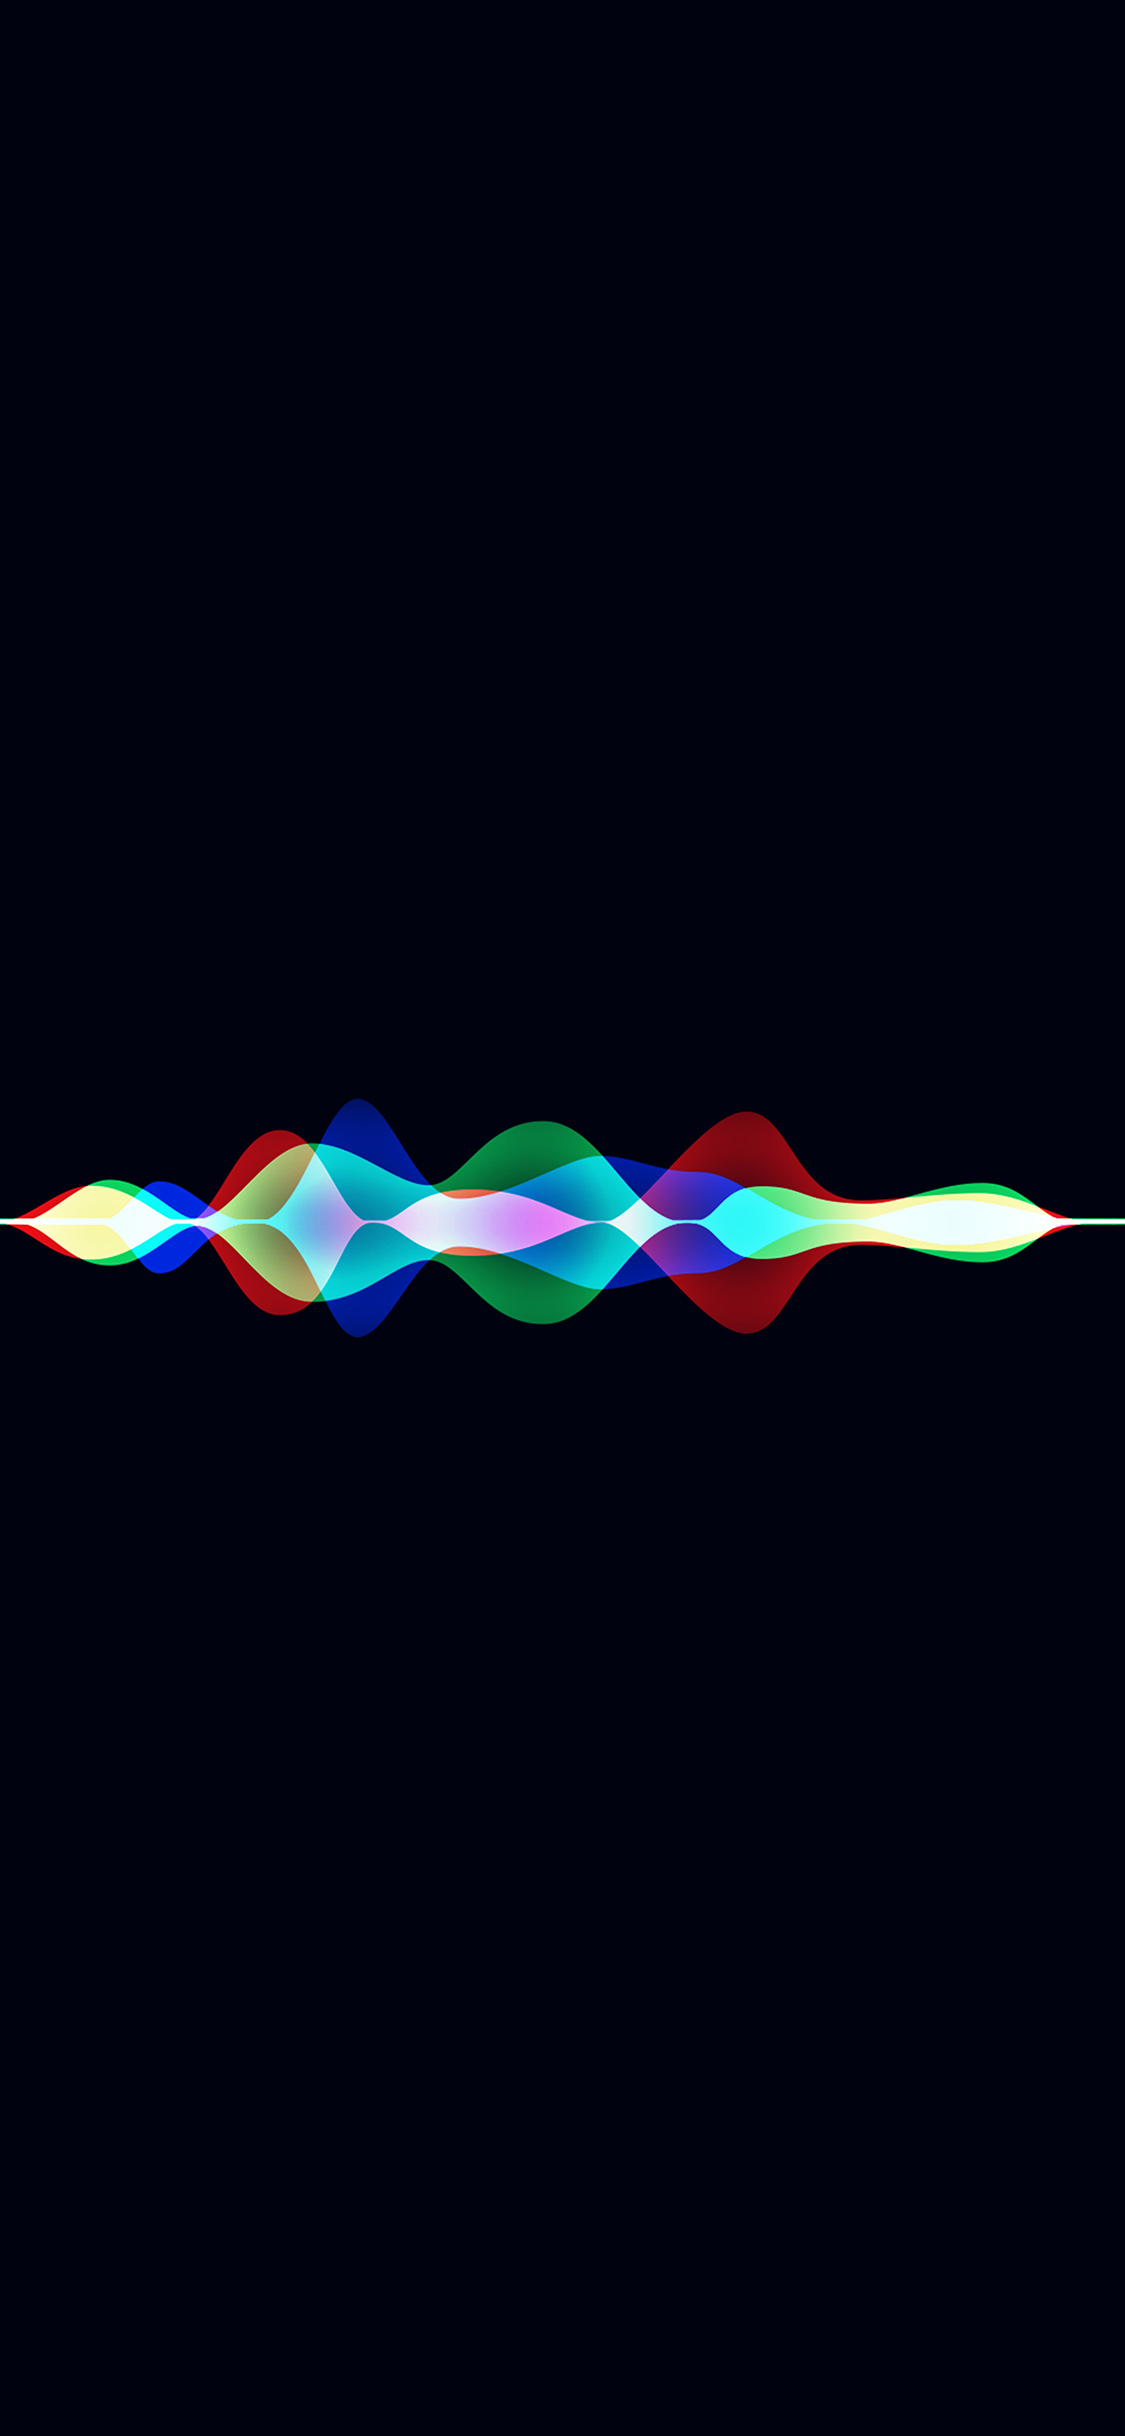 iPhoneXpapers.com-Apple-iPhone-wallpaper-vq05-siri-dark-rainbow-black-art-apple-pattern